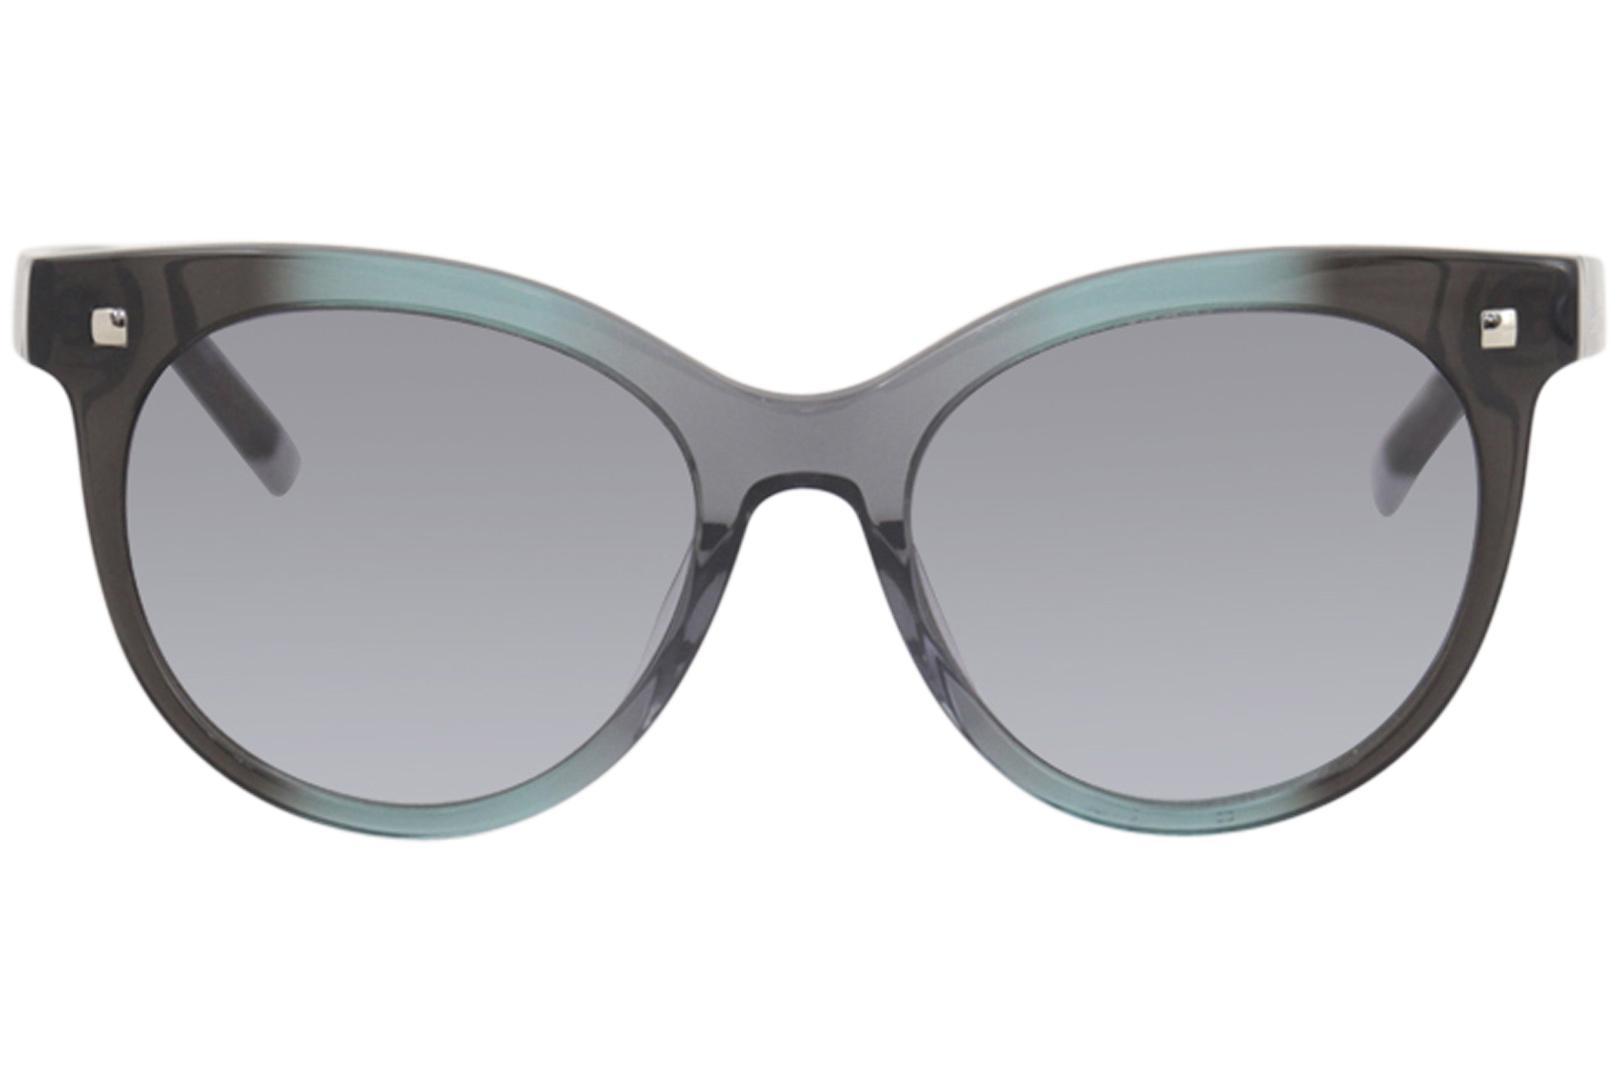 c6d04e86ef Calvin Klein Women s CK4324S CK 4324 S Fashion Cateye Sunglasses by Calvin  Klein. 12345